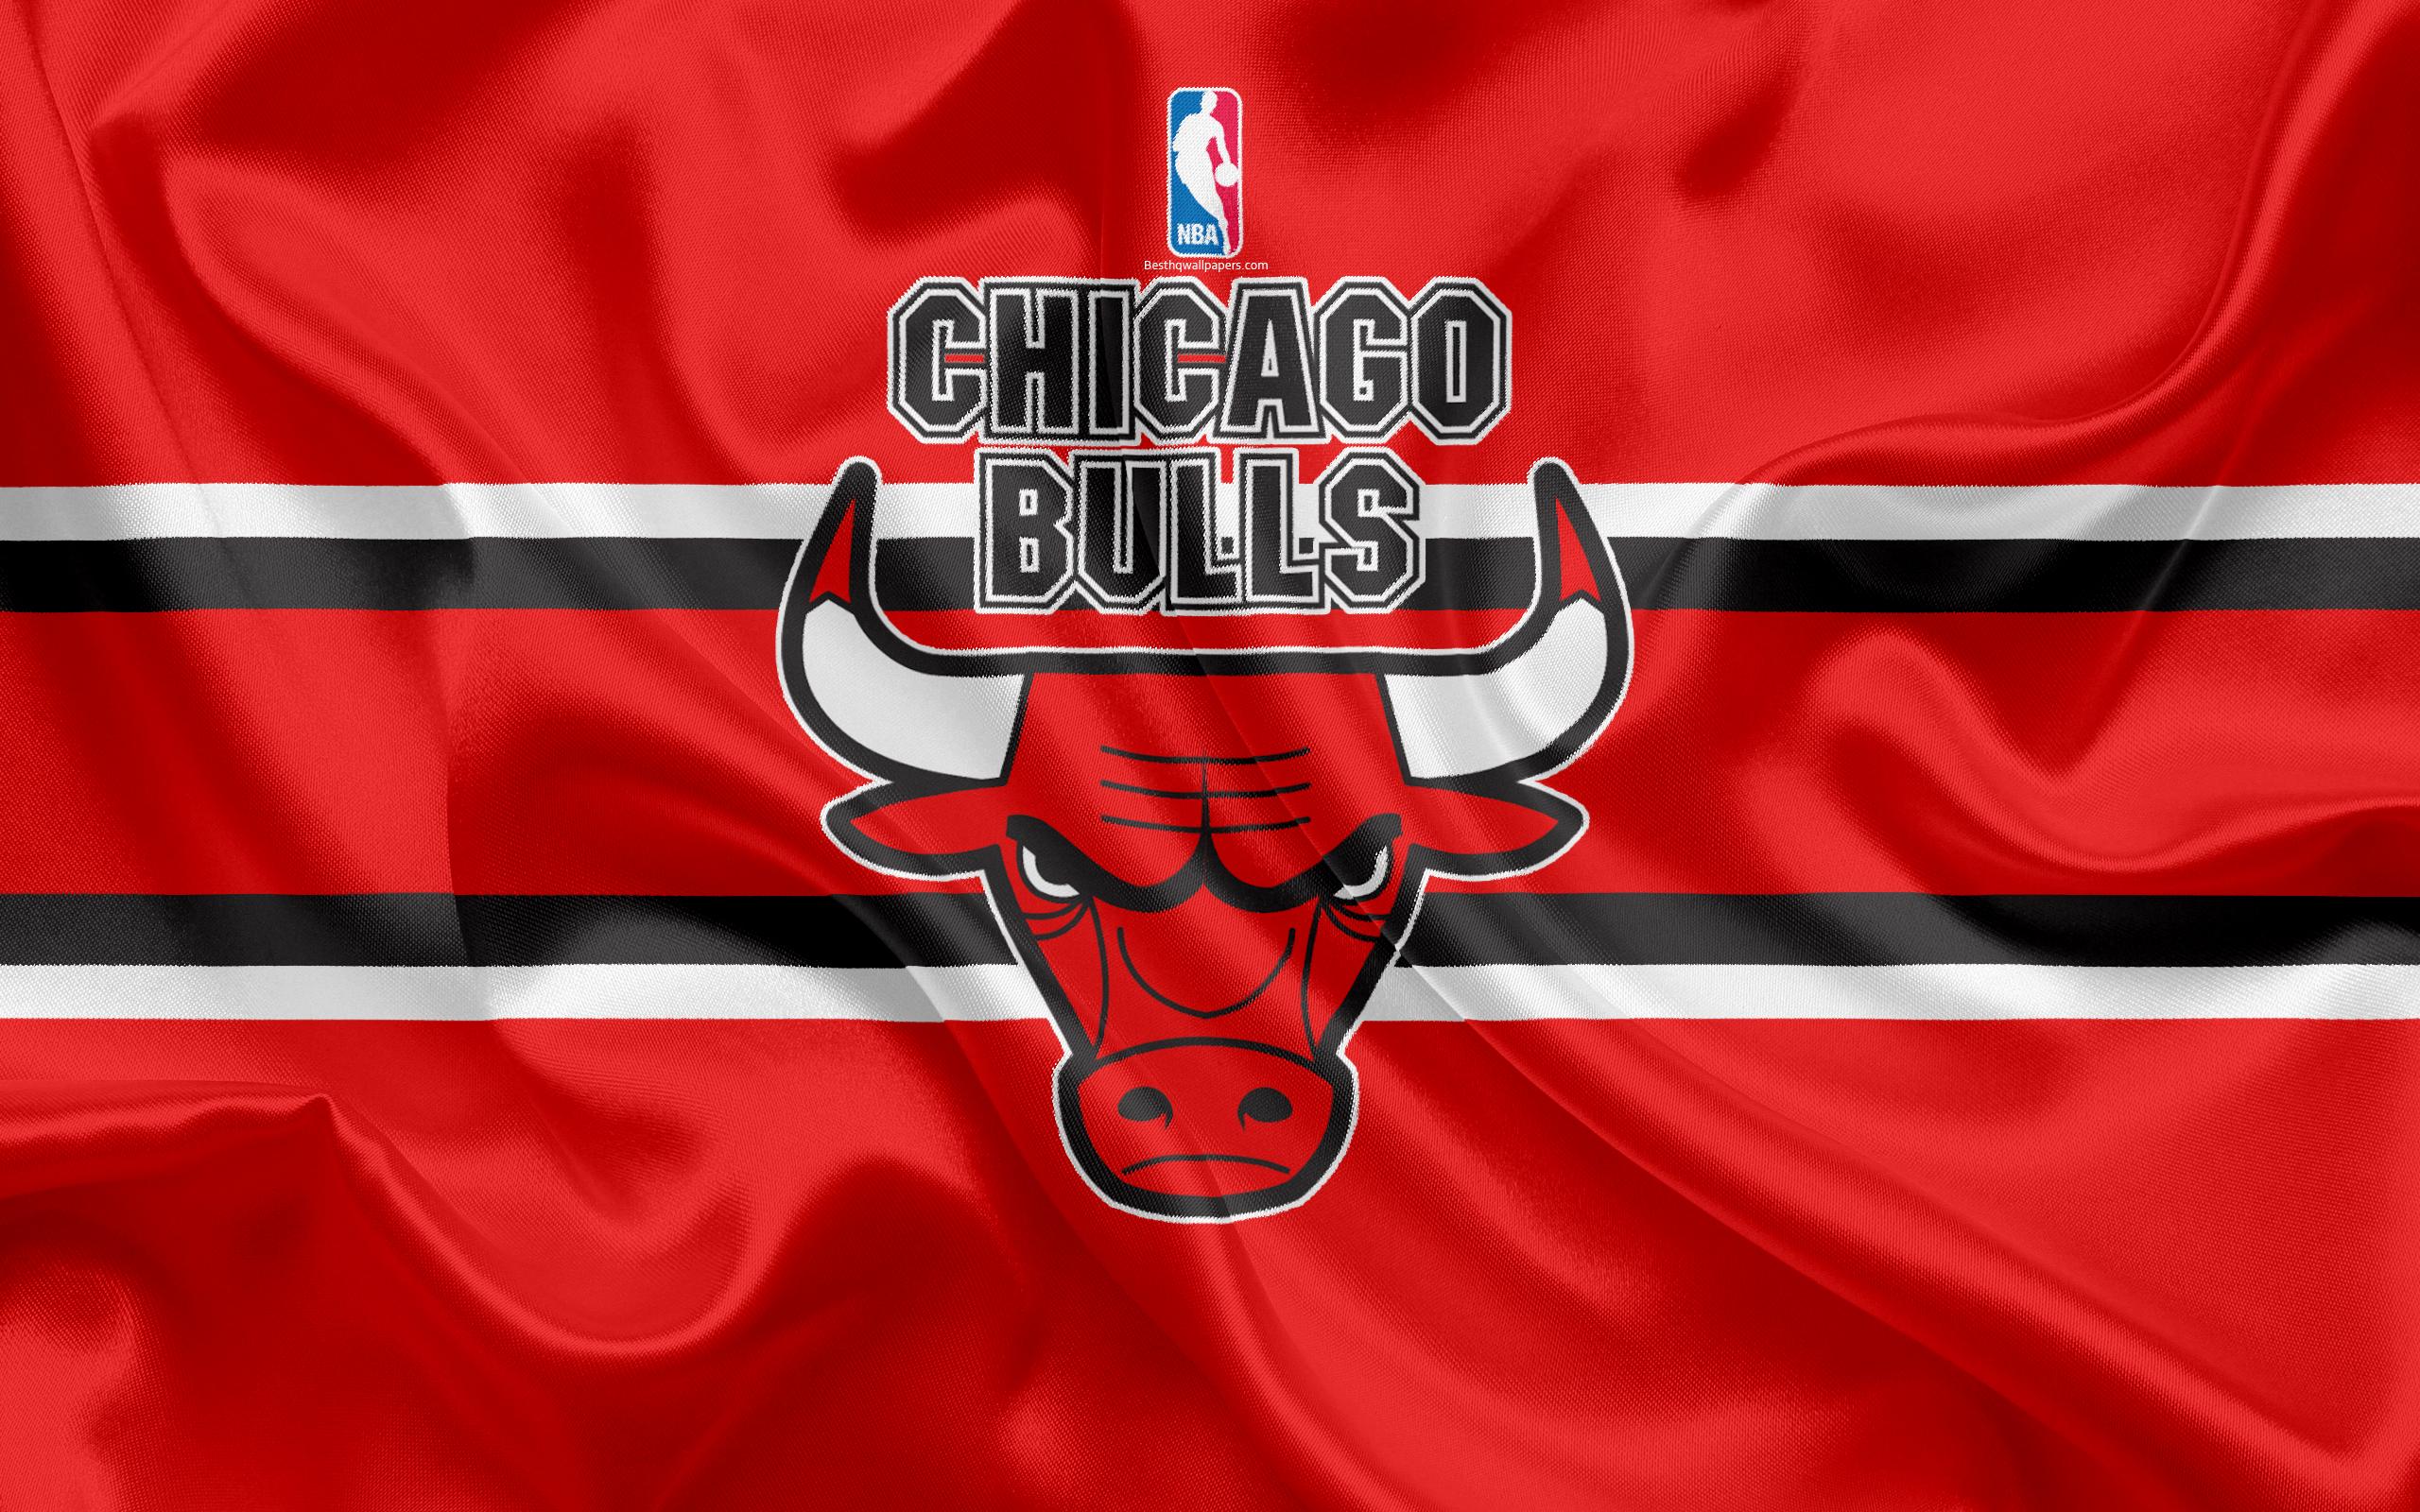 Chicago Bulls Logo Hd Wallpaper Background Image 2560x1600